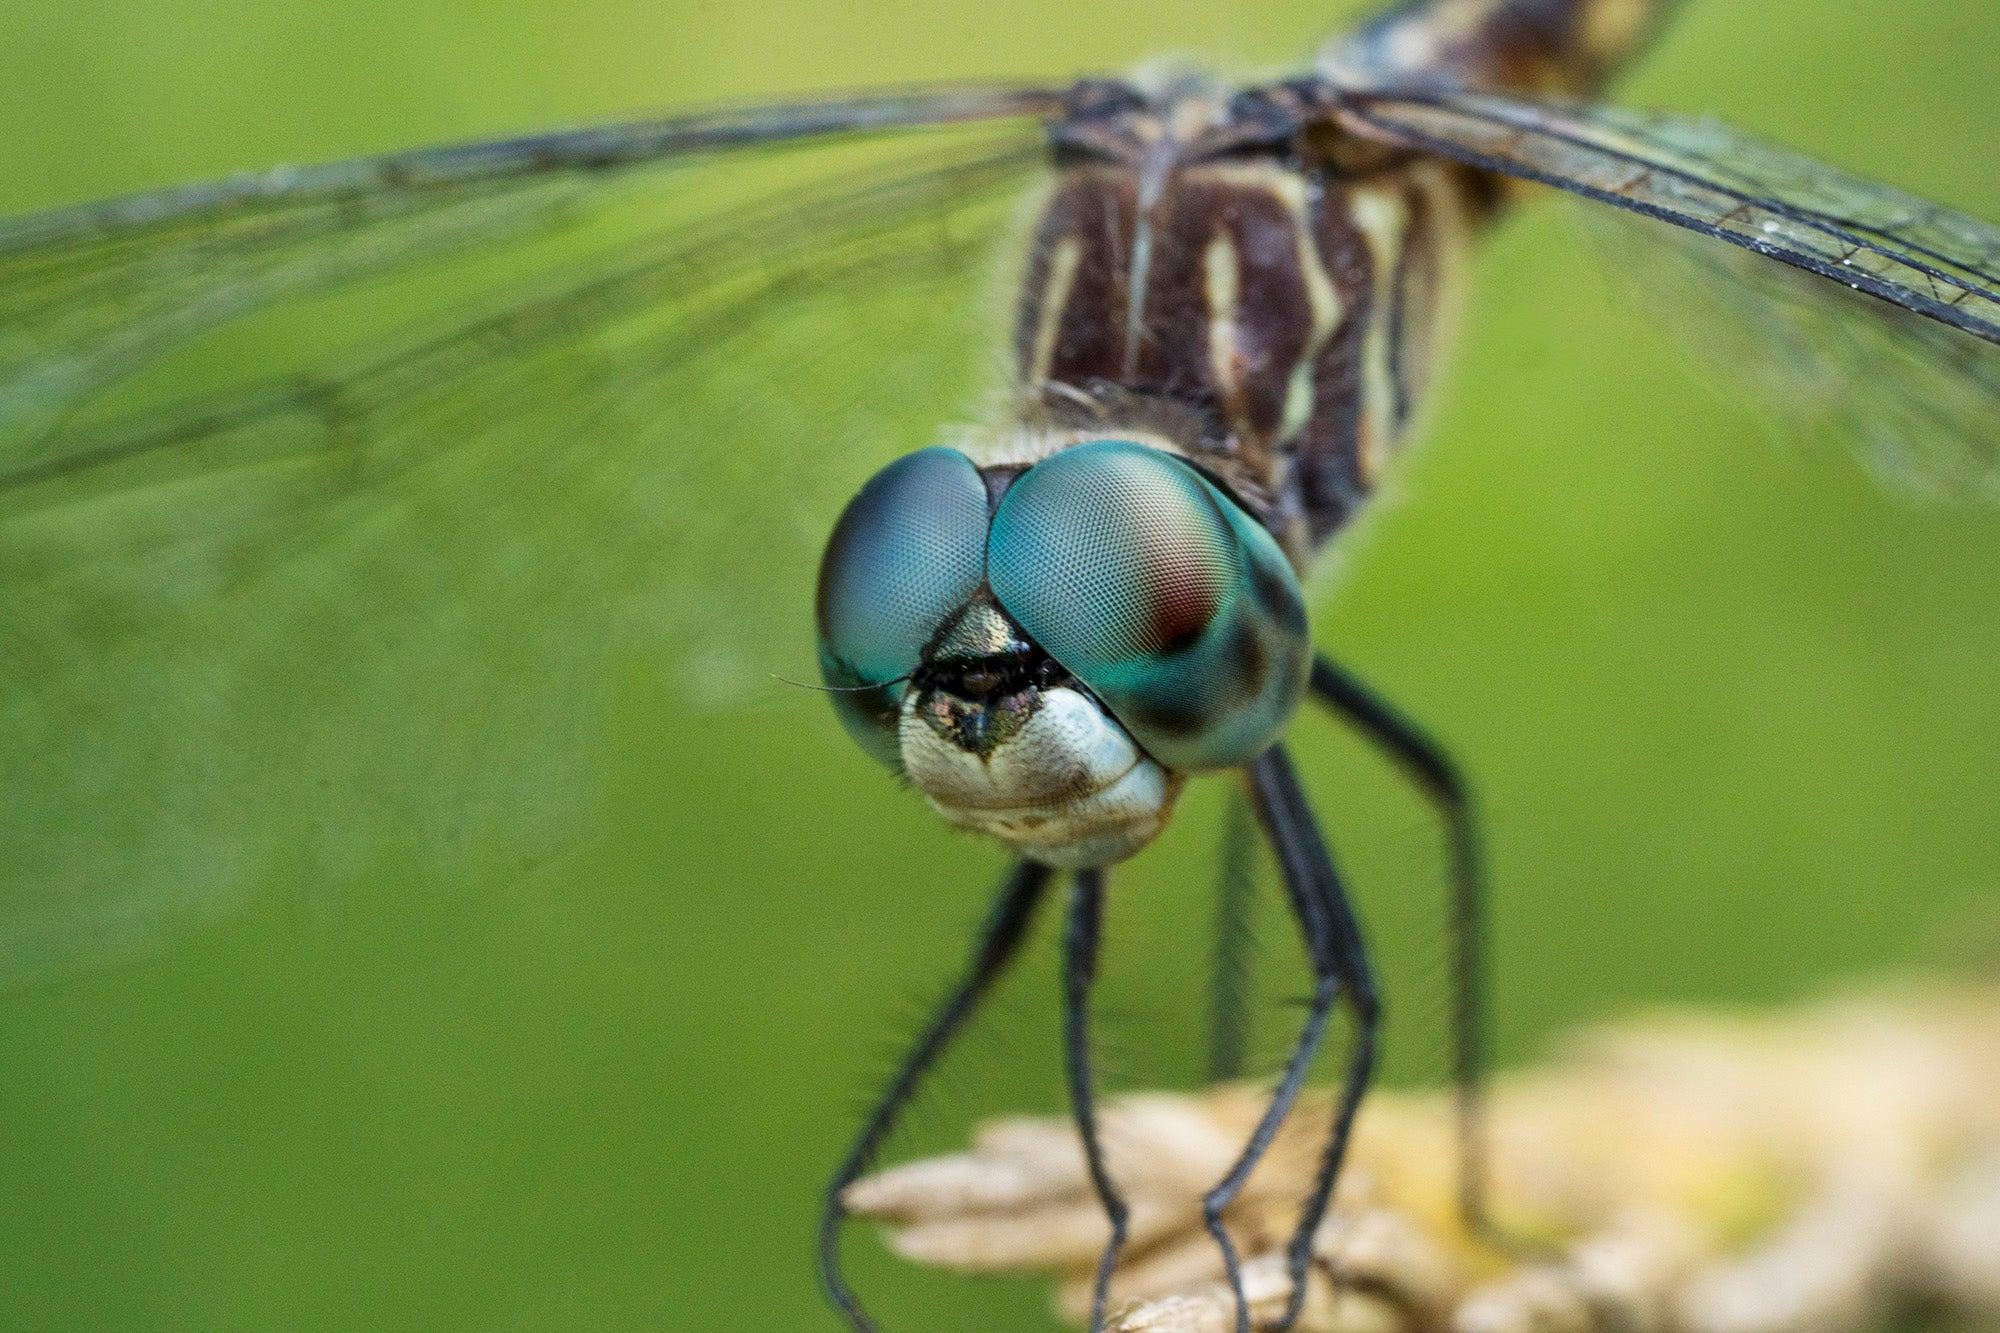 Alpha-Universe-Alpha-Female-Plus-Dragonfly-By-Sandee-Lim.jpg